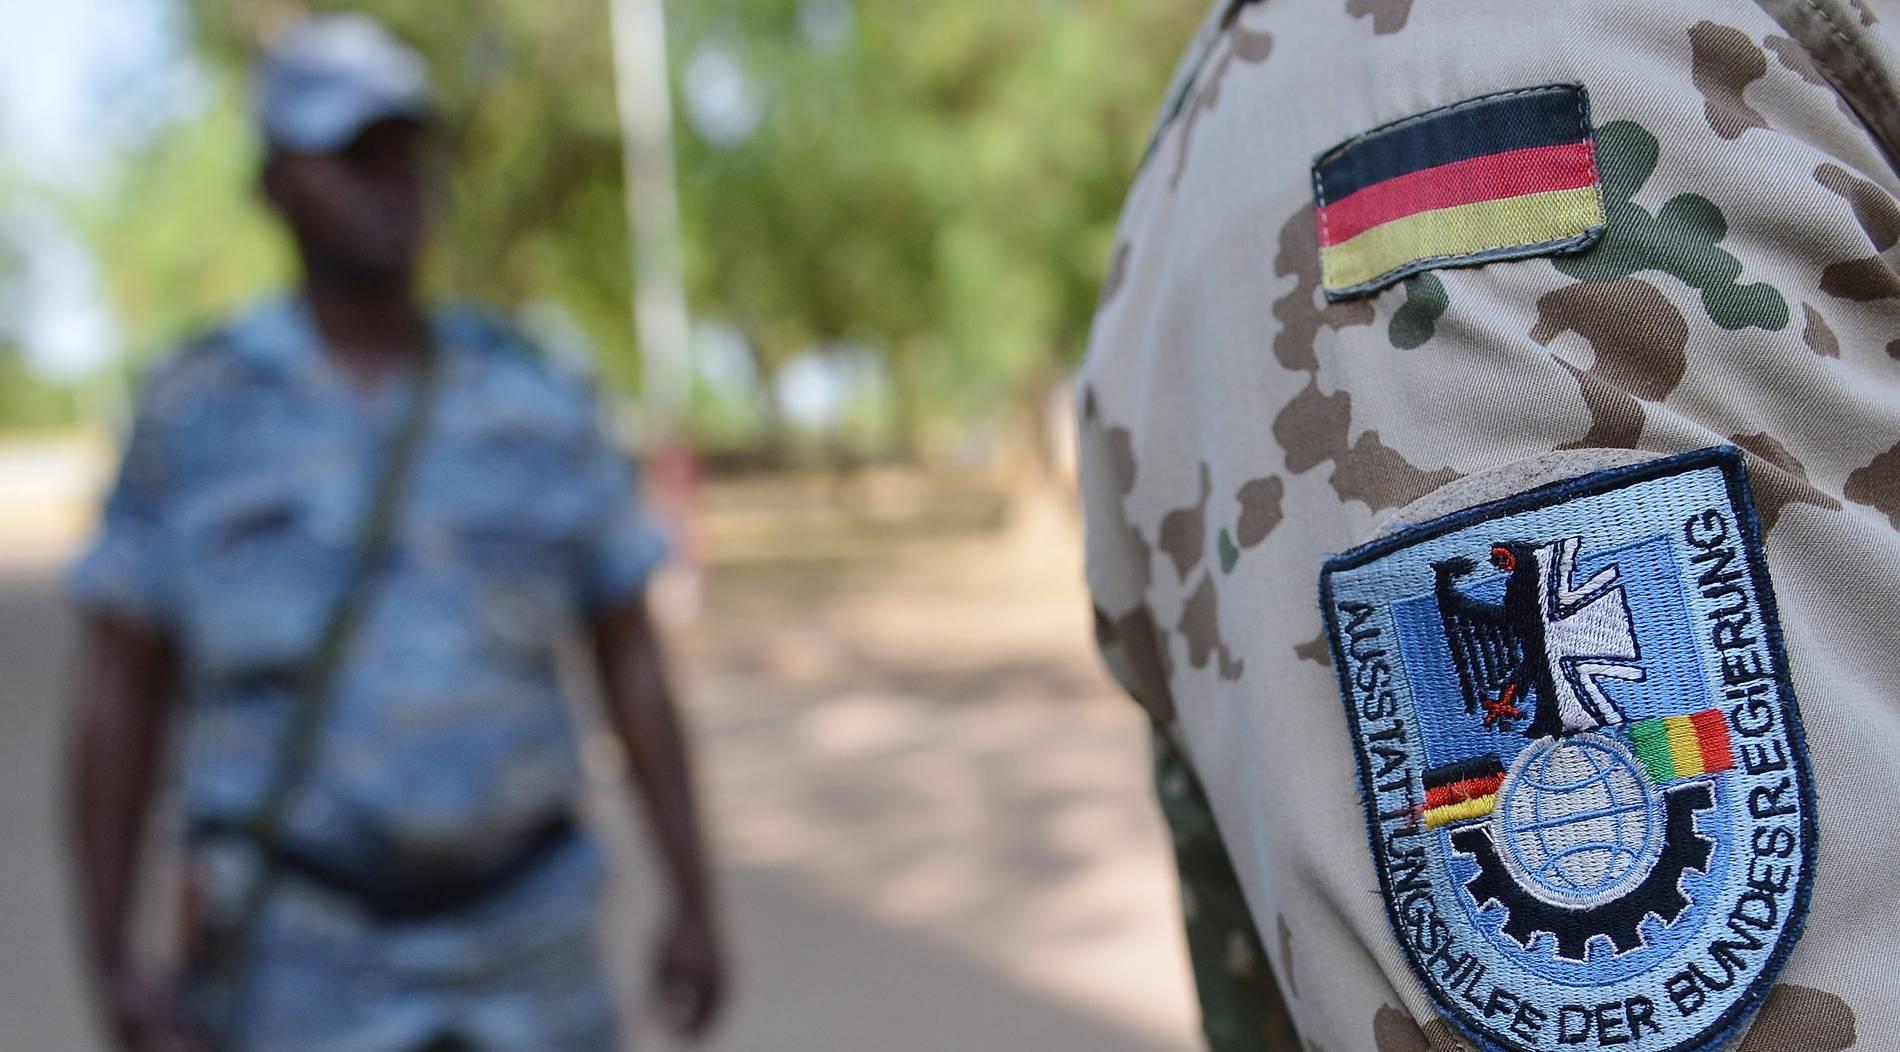 Bundeswehrsoldaten in Mali unter Beschus geraten